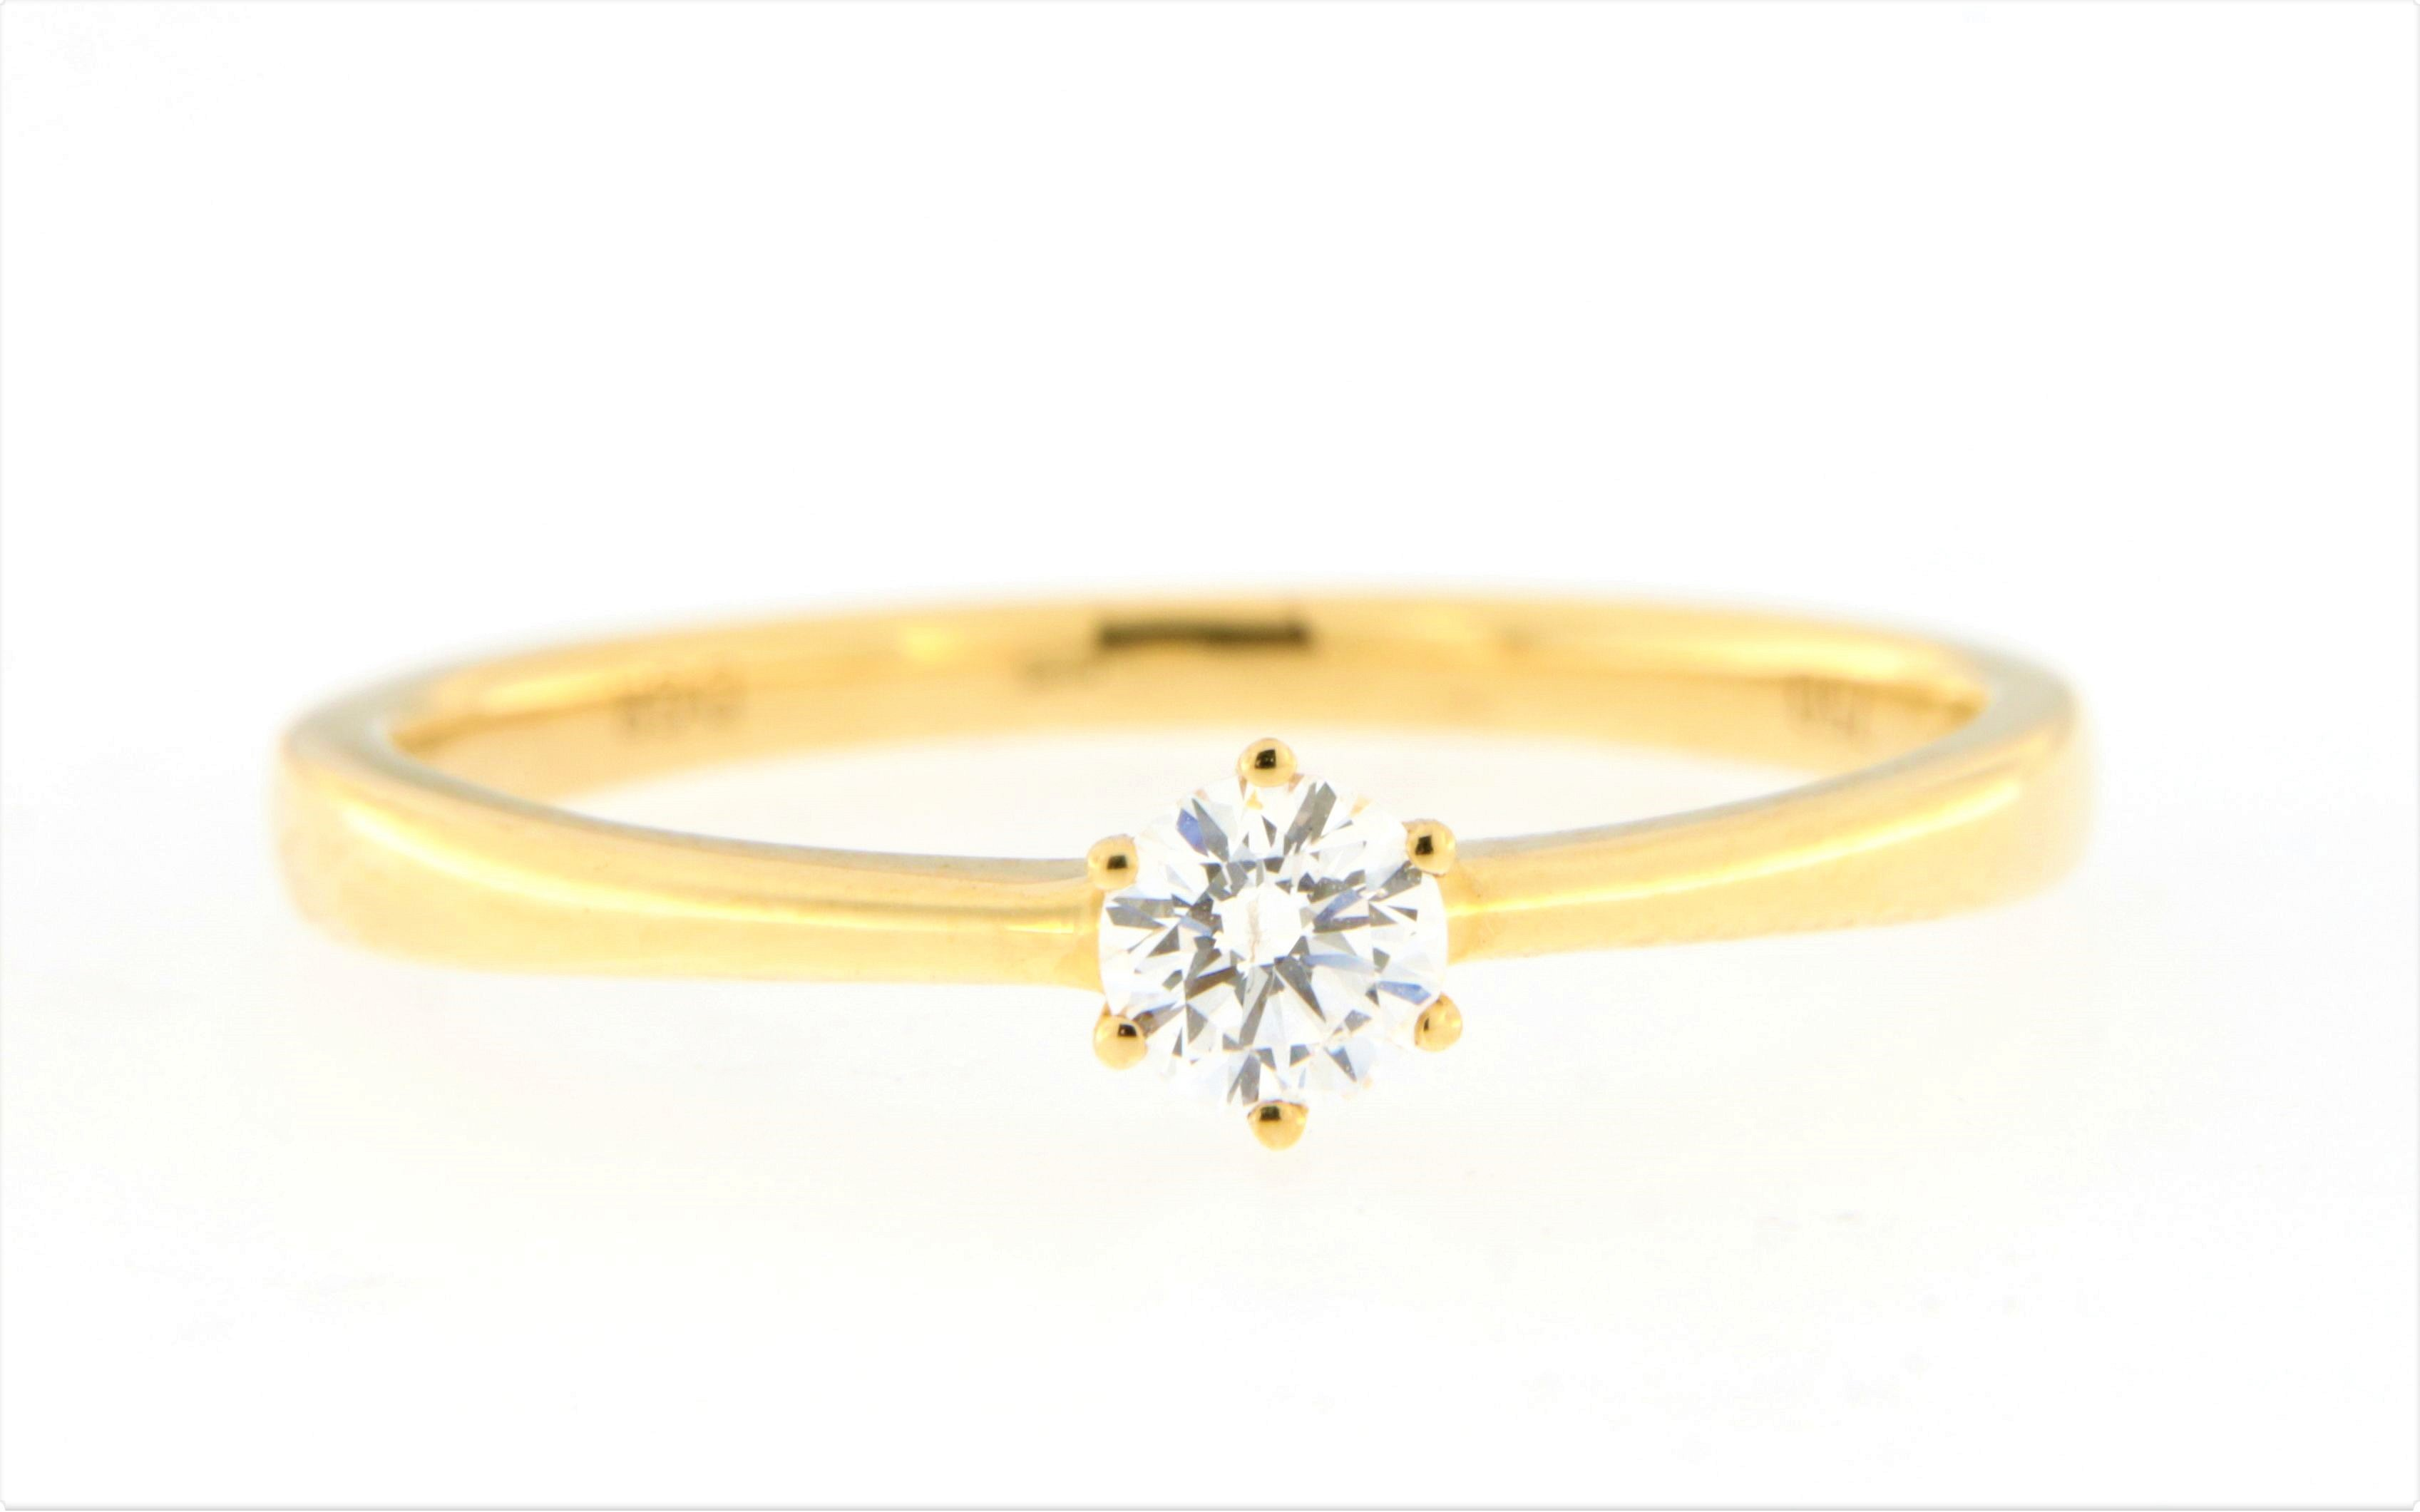 Eveline Frischknecht fine Jewellery